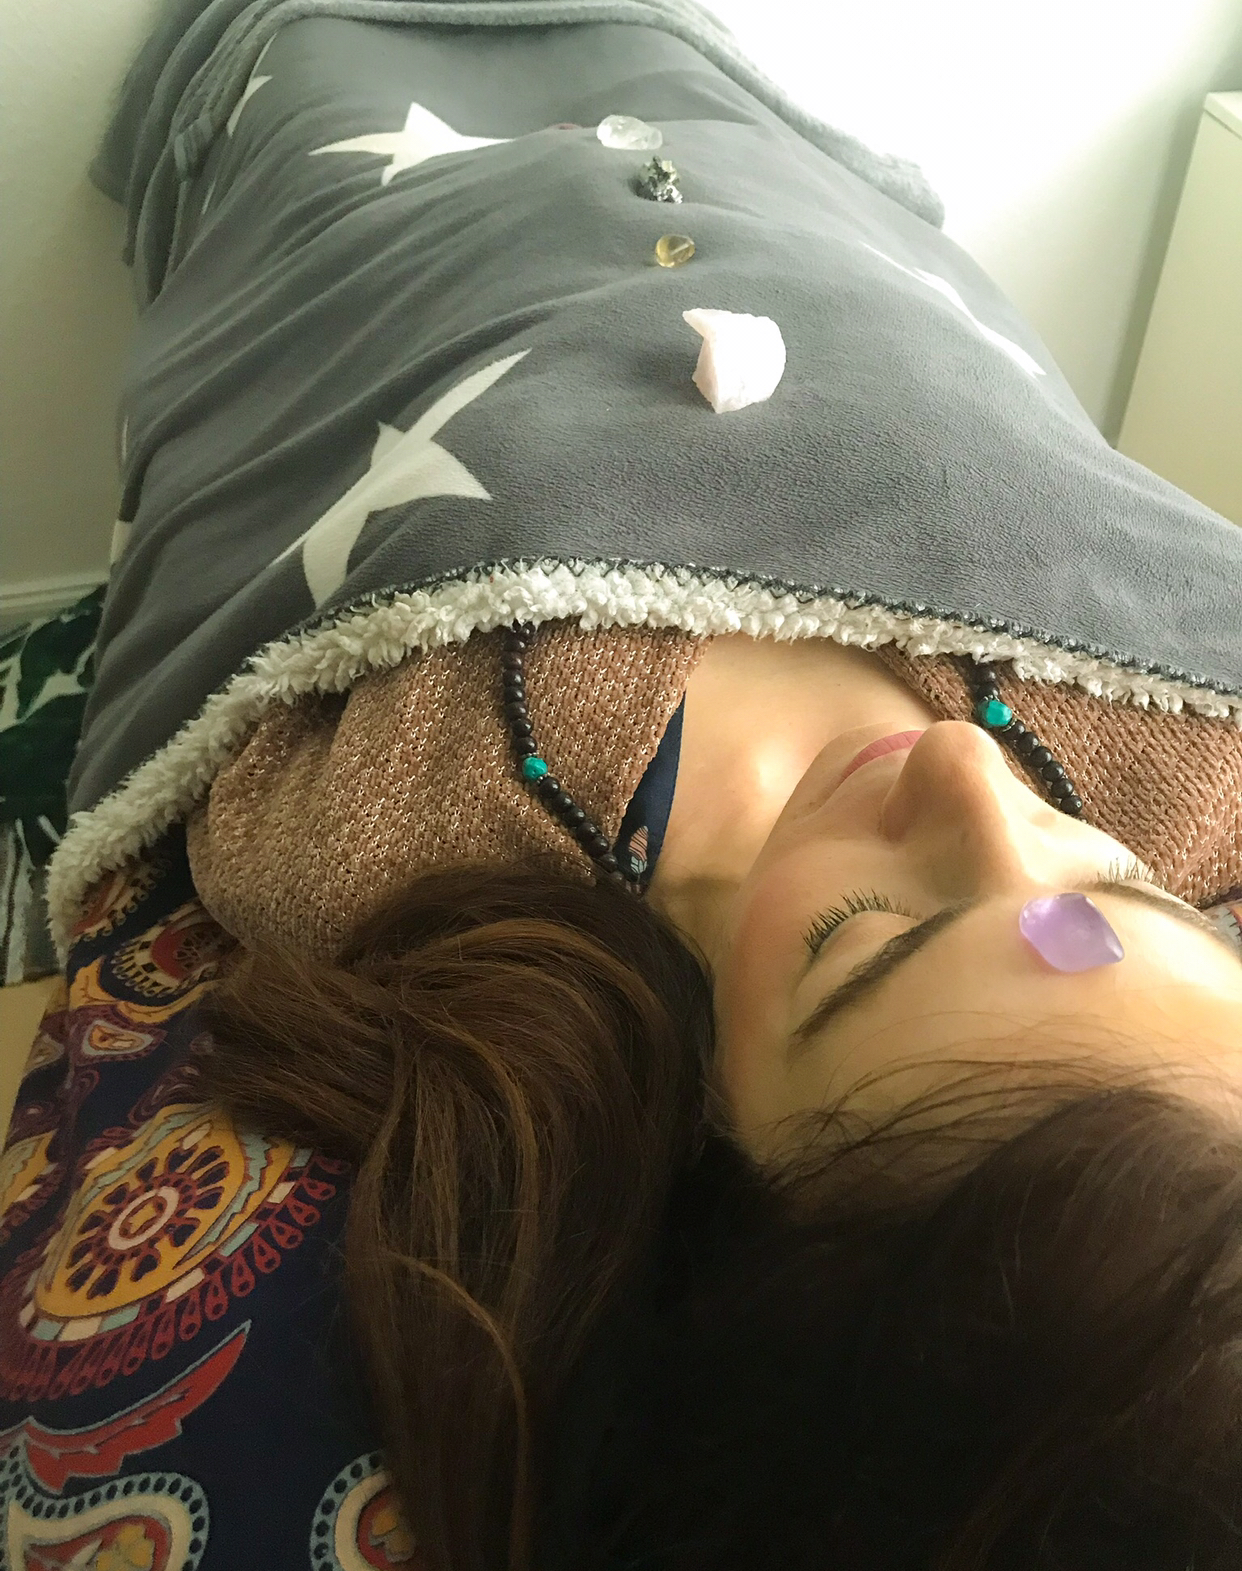 Giving Heather a birthday Reiki treatment.